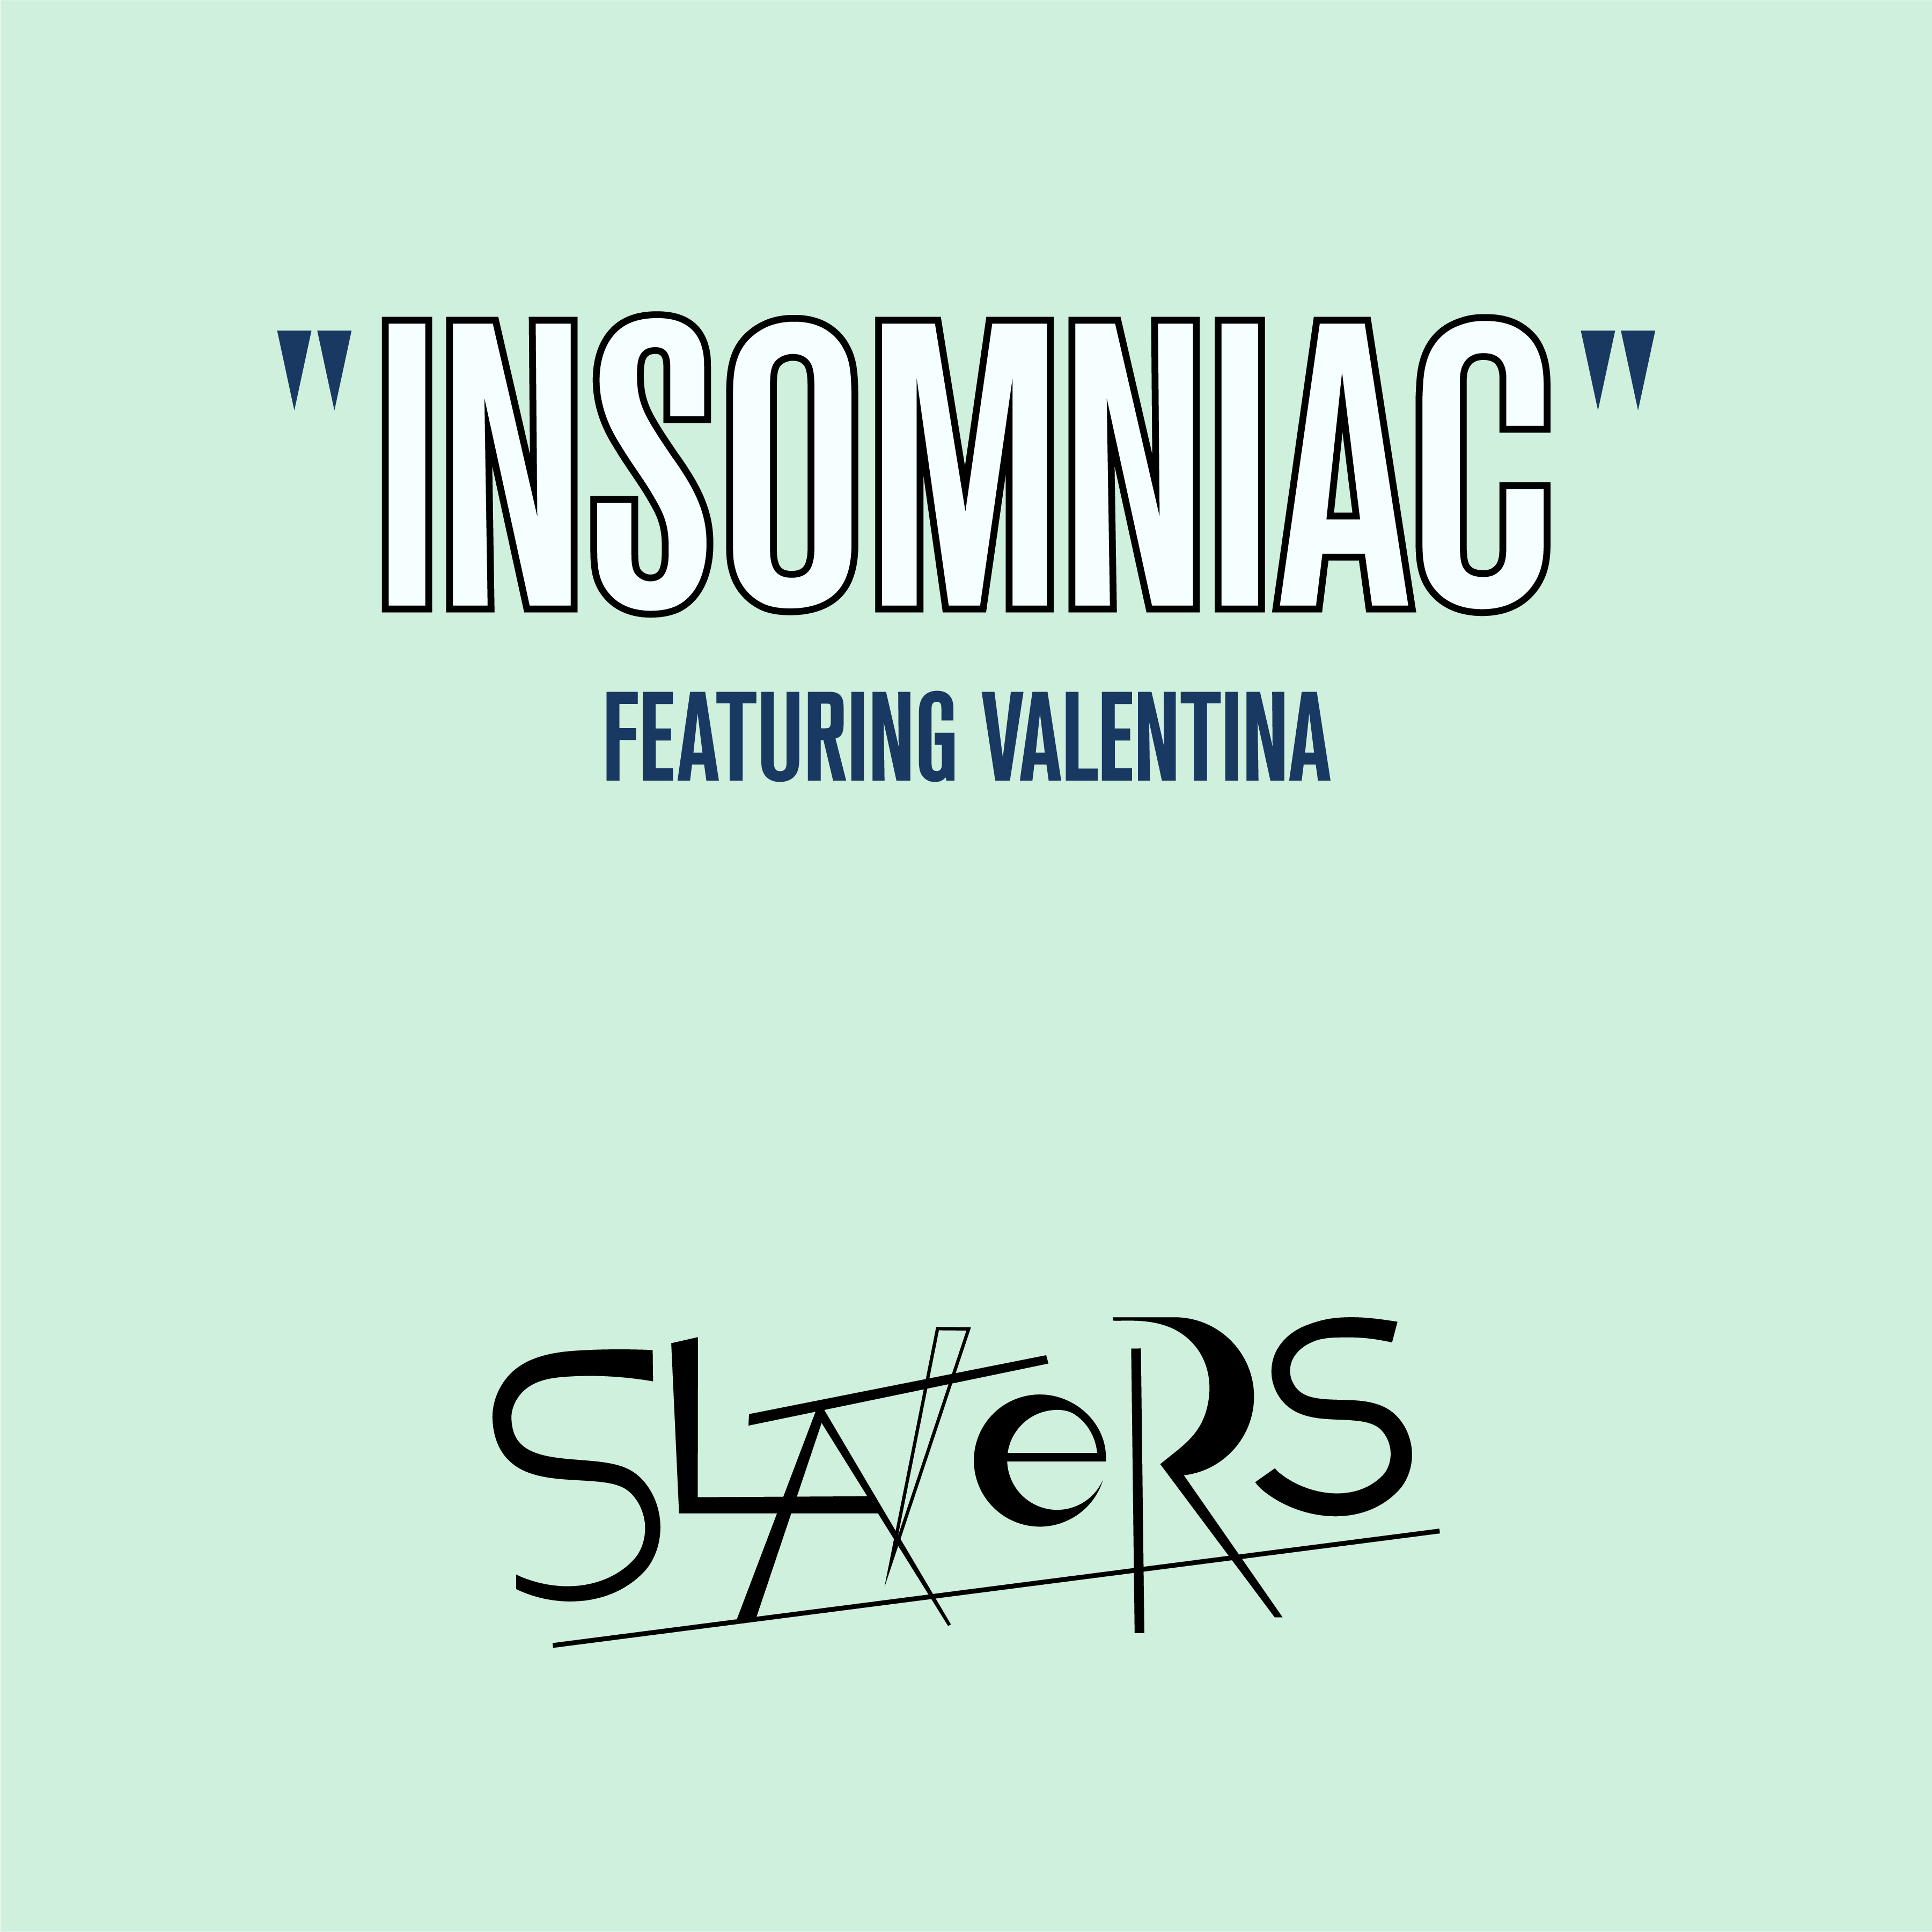 Slaters - Insomniac feat. Valentina (Digital Download)